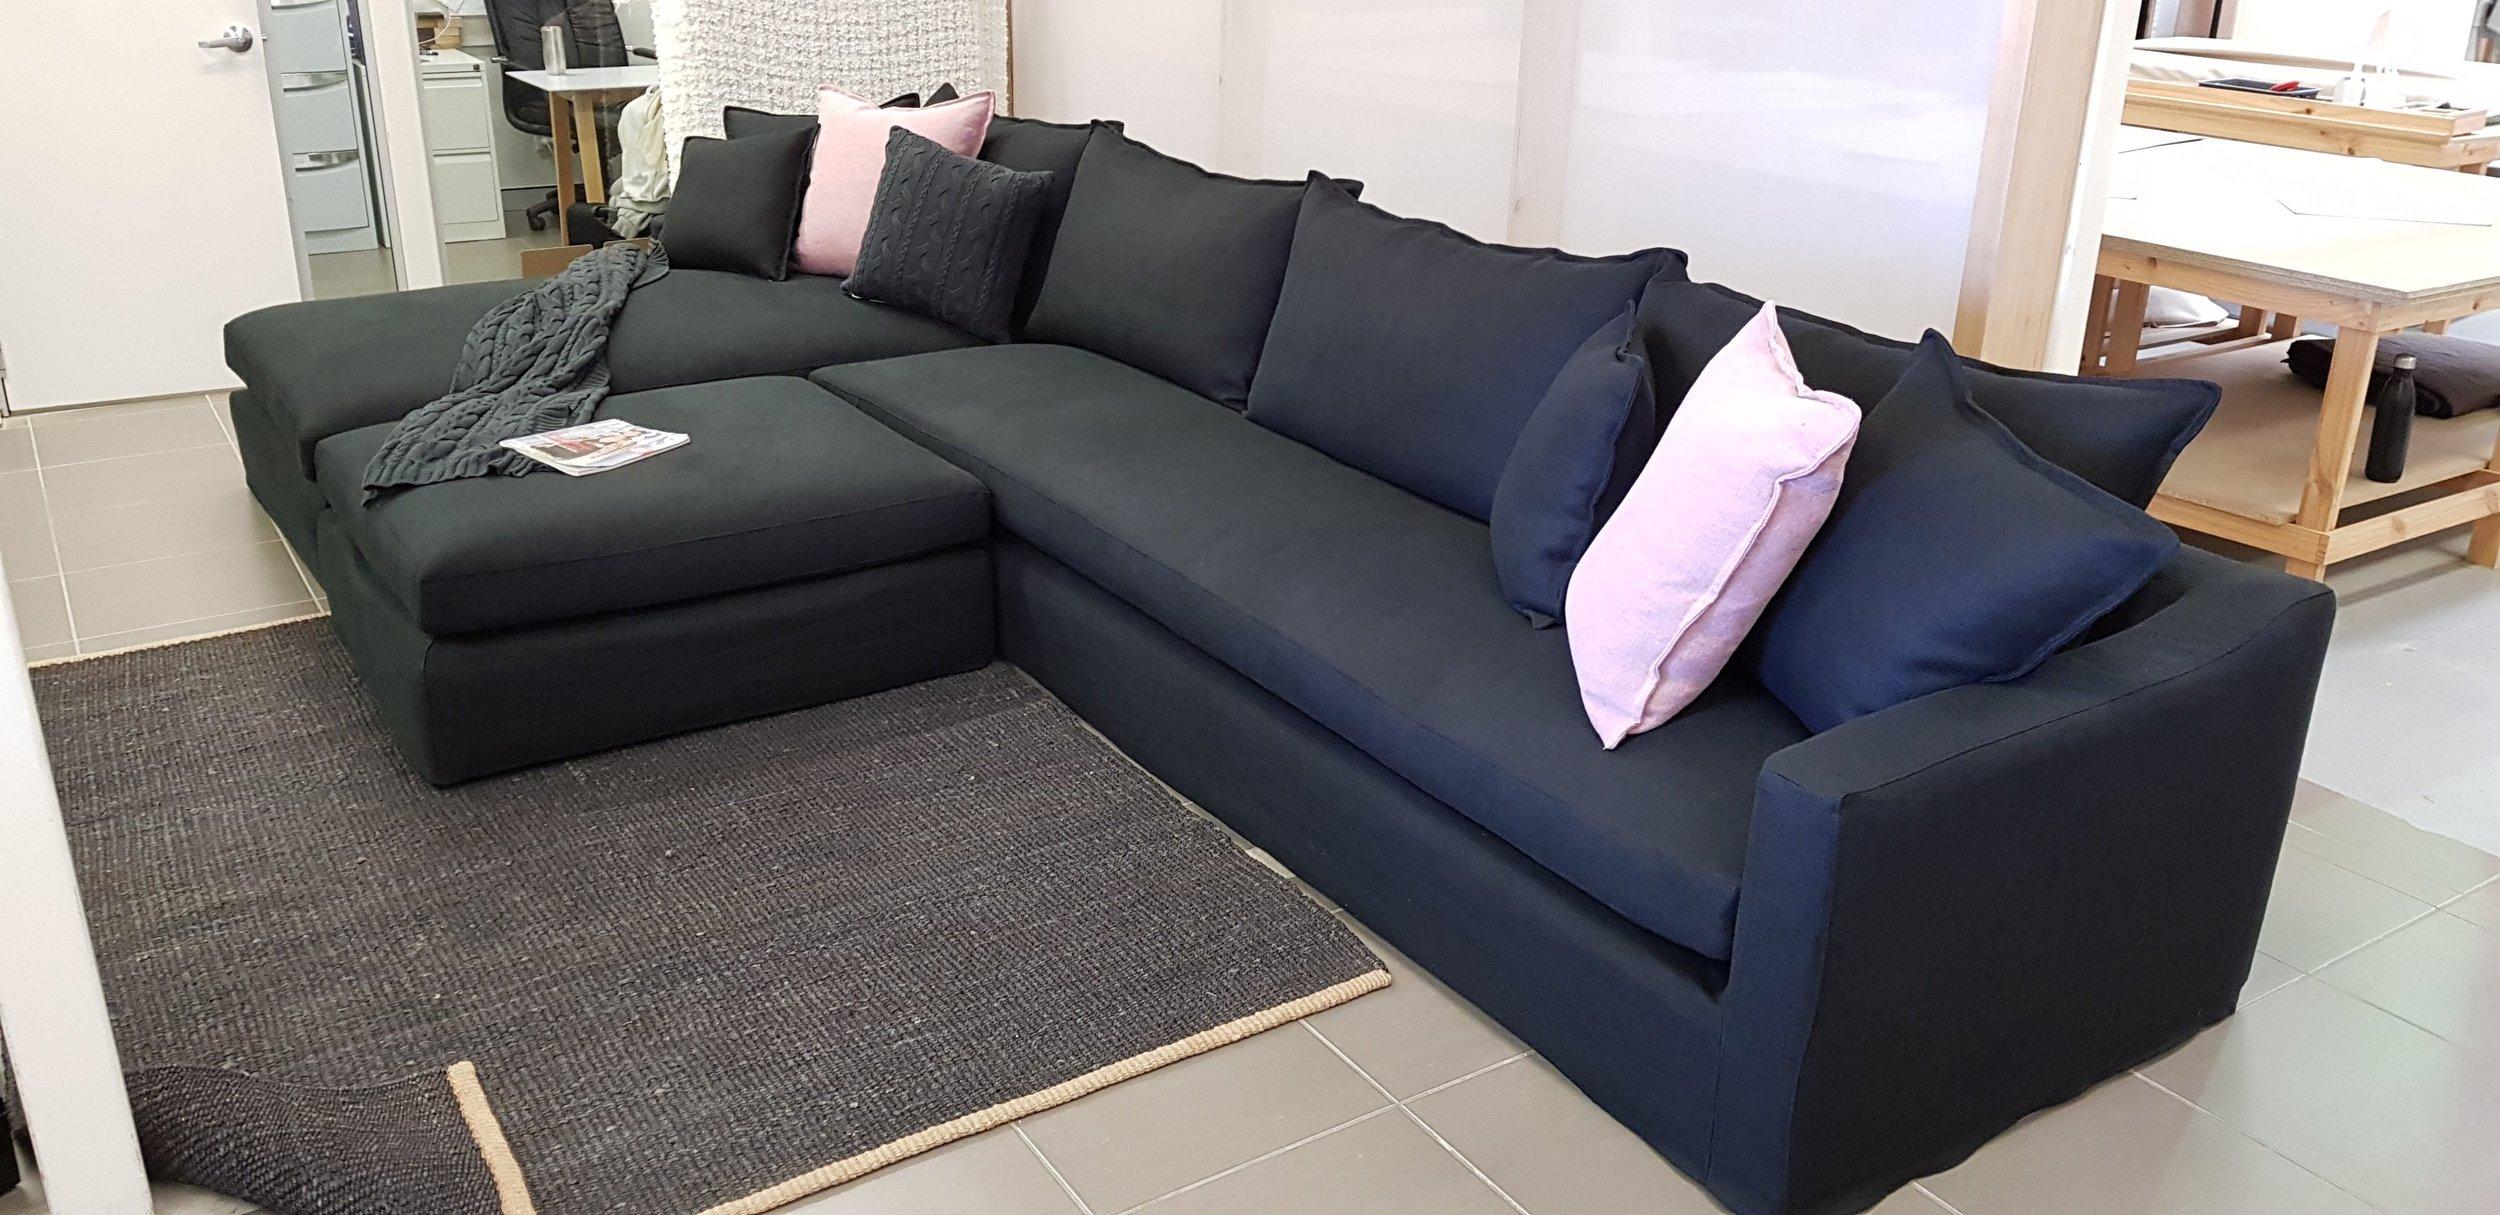 Karen Sofa Range - Bespoke setting